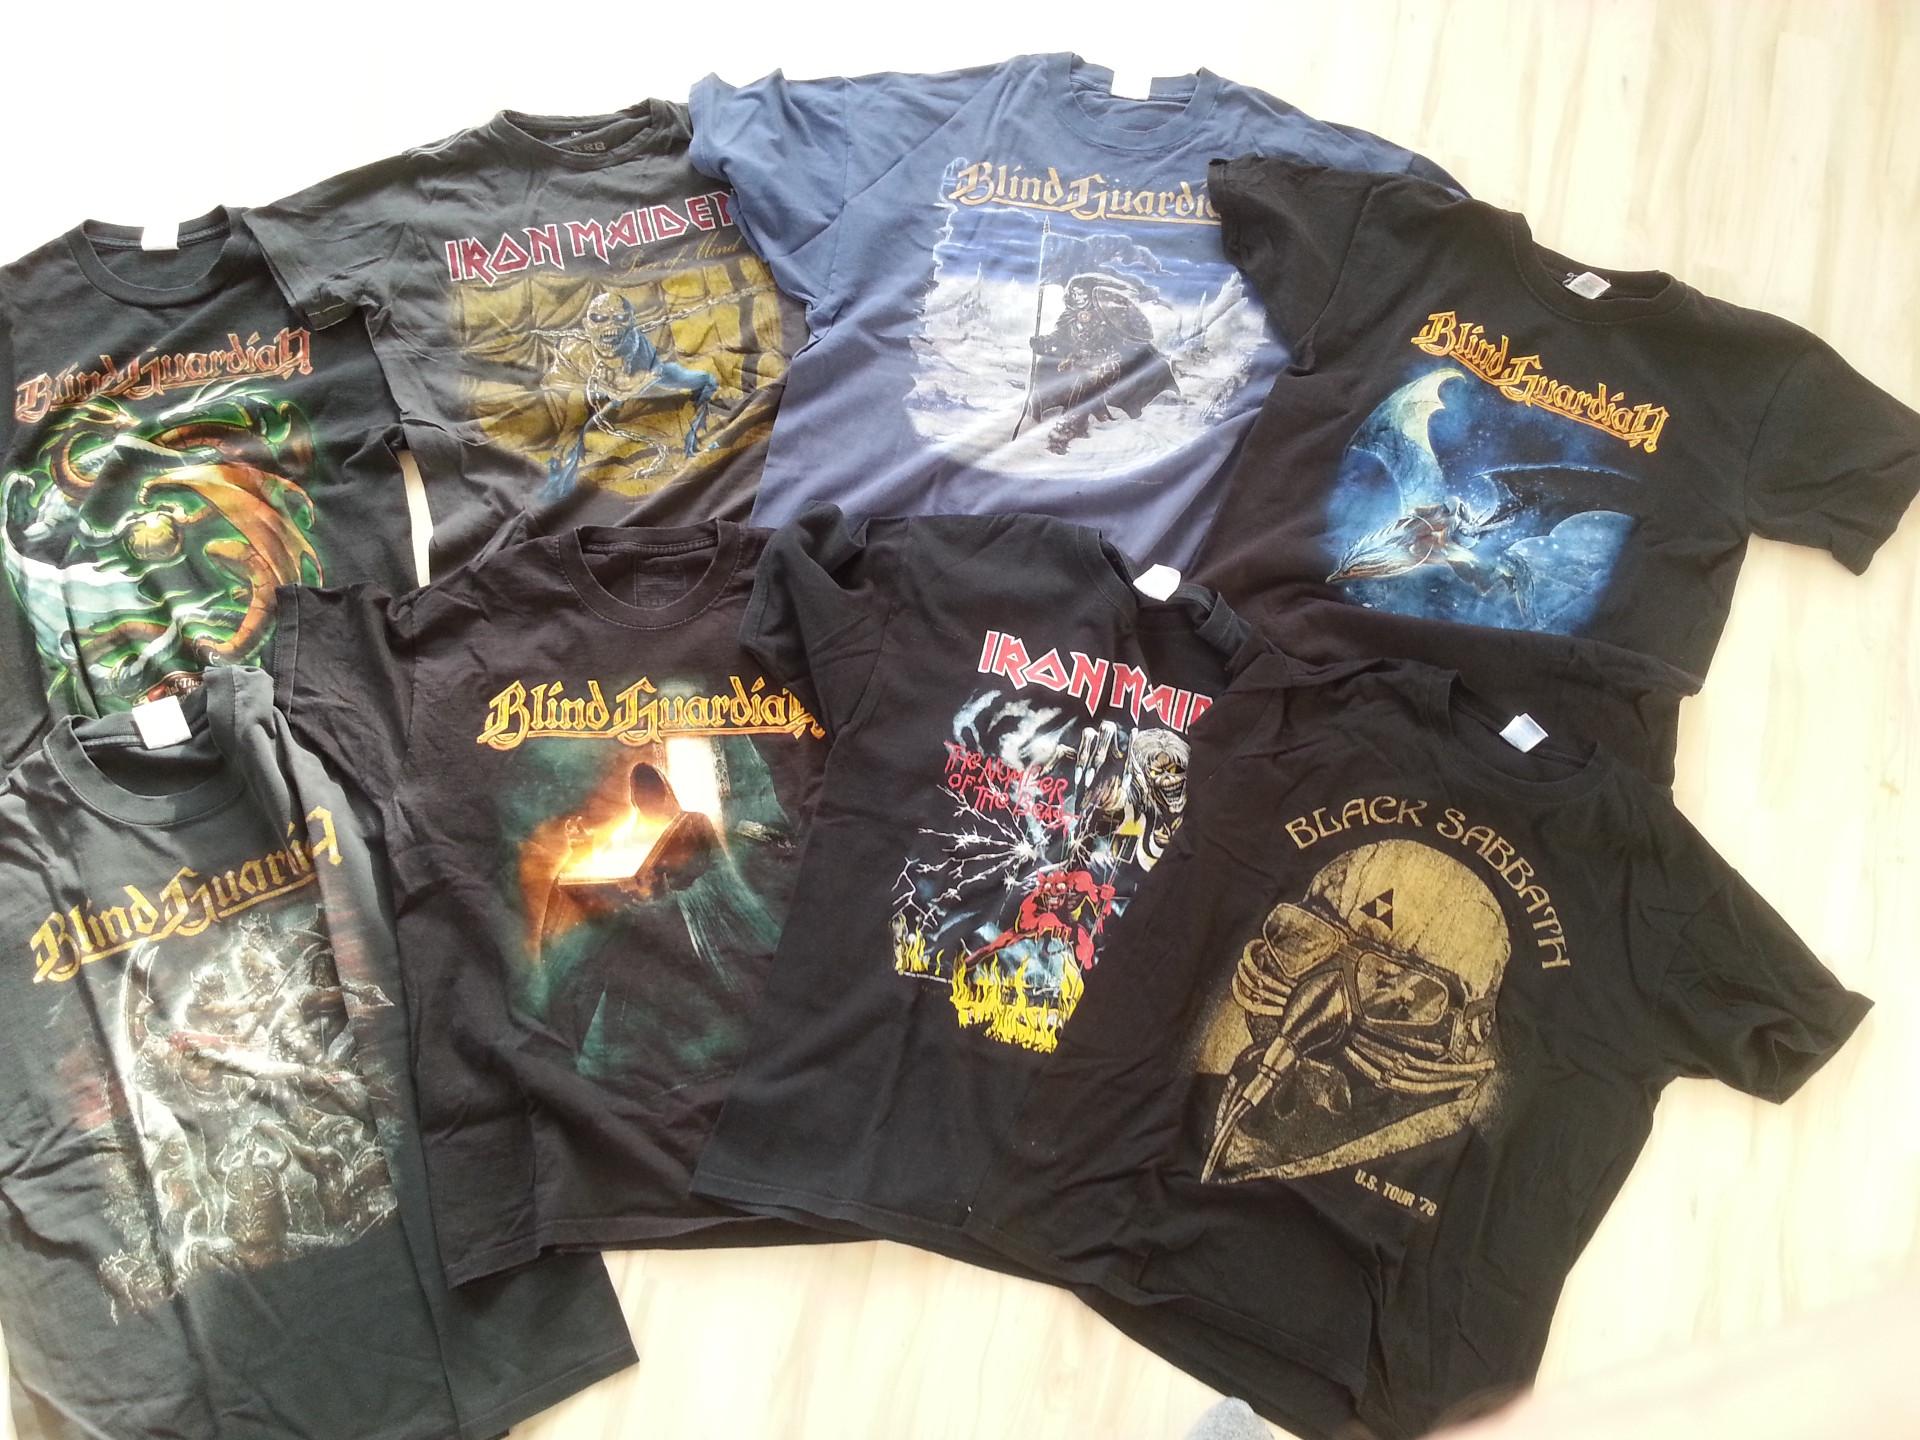 the unorganized t-shirt - olivertacke.de